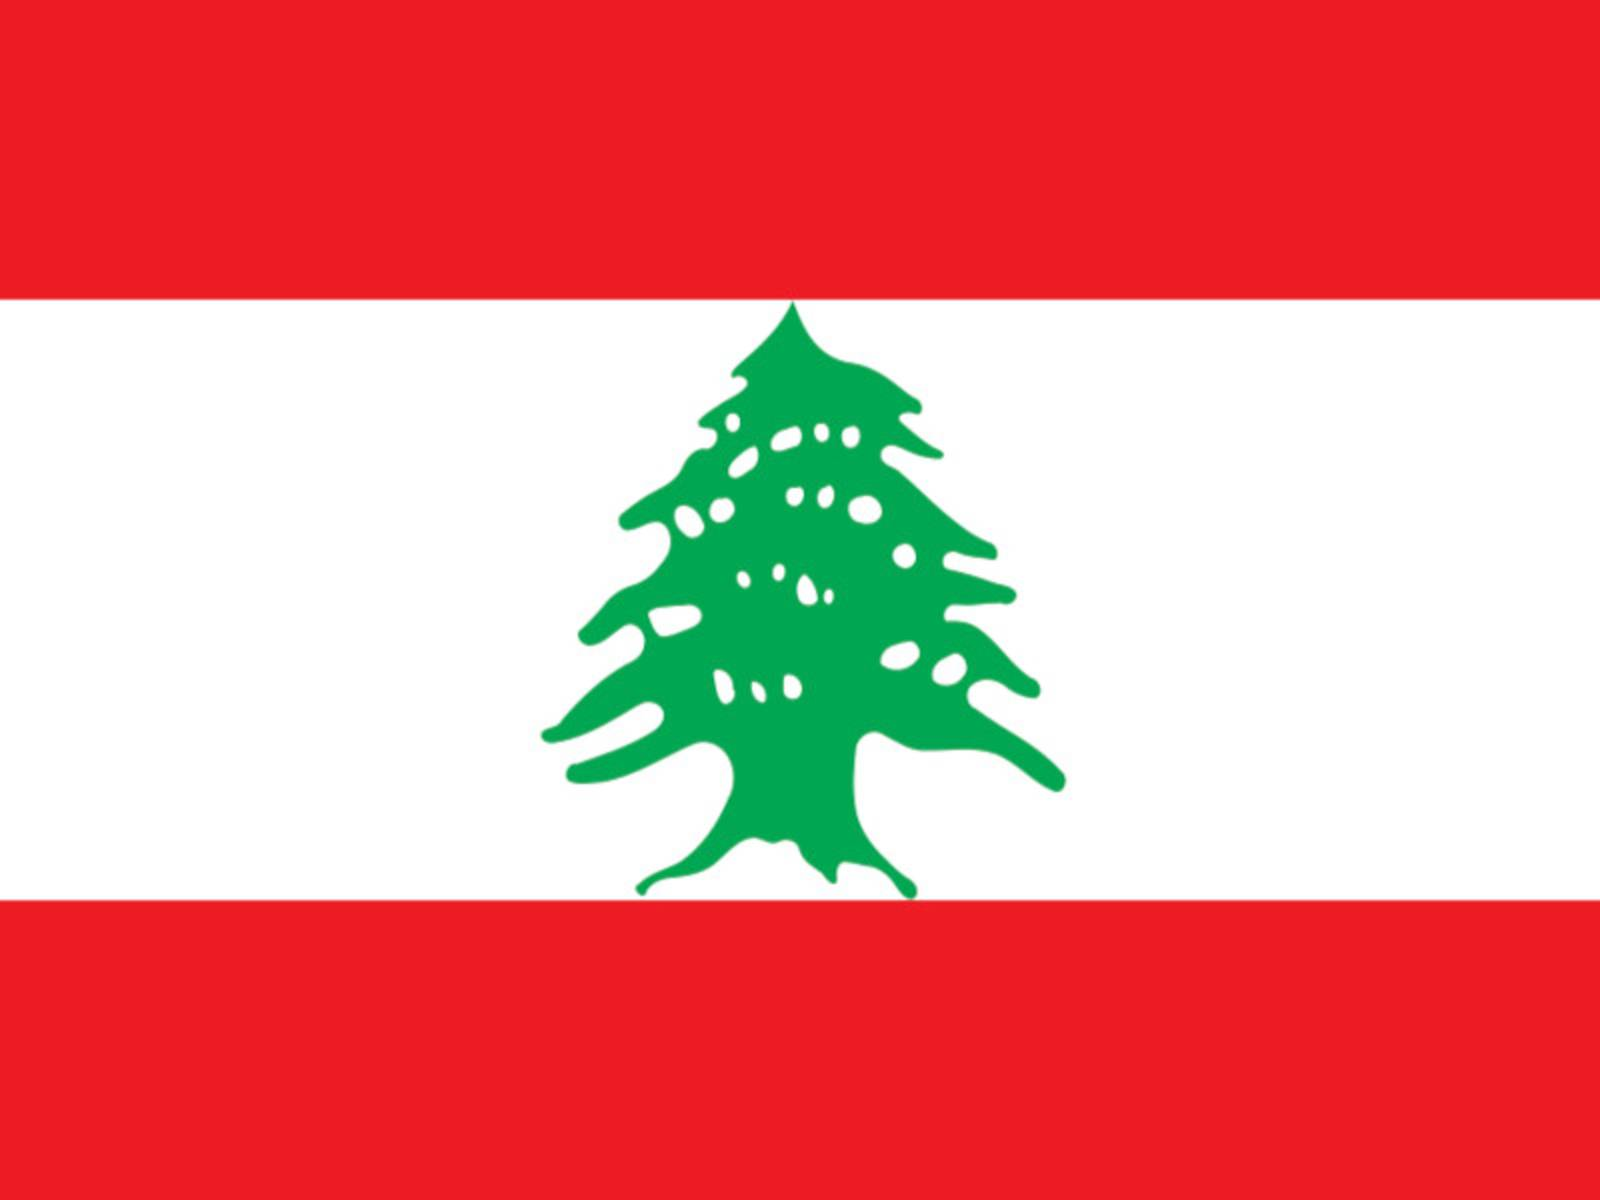 Flagge des Libanon